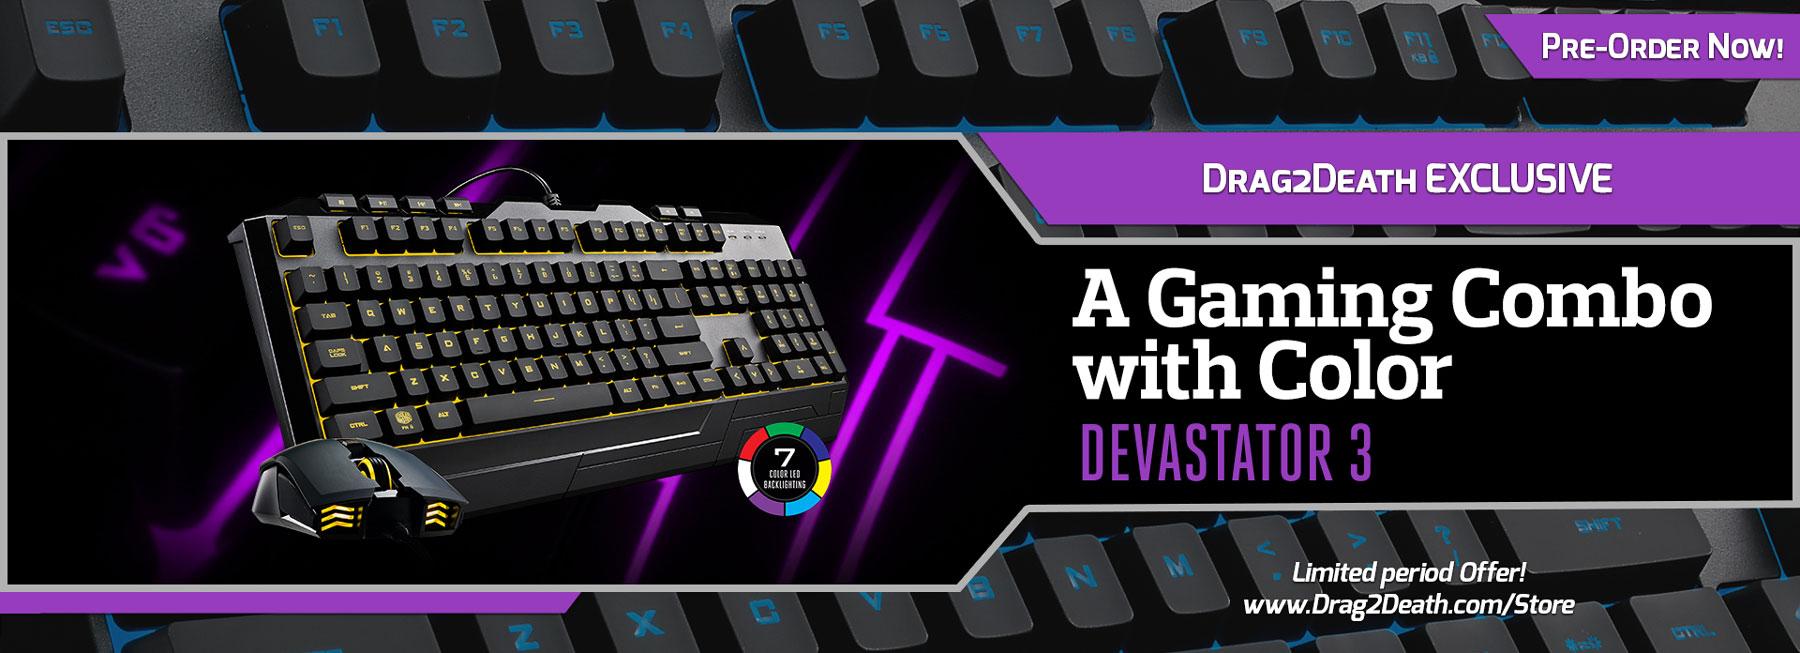 Devastator3-Exclusive-Offer